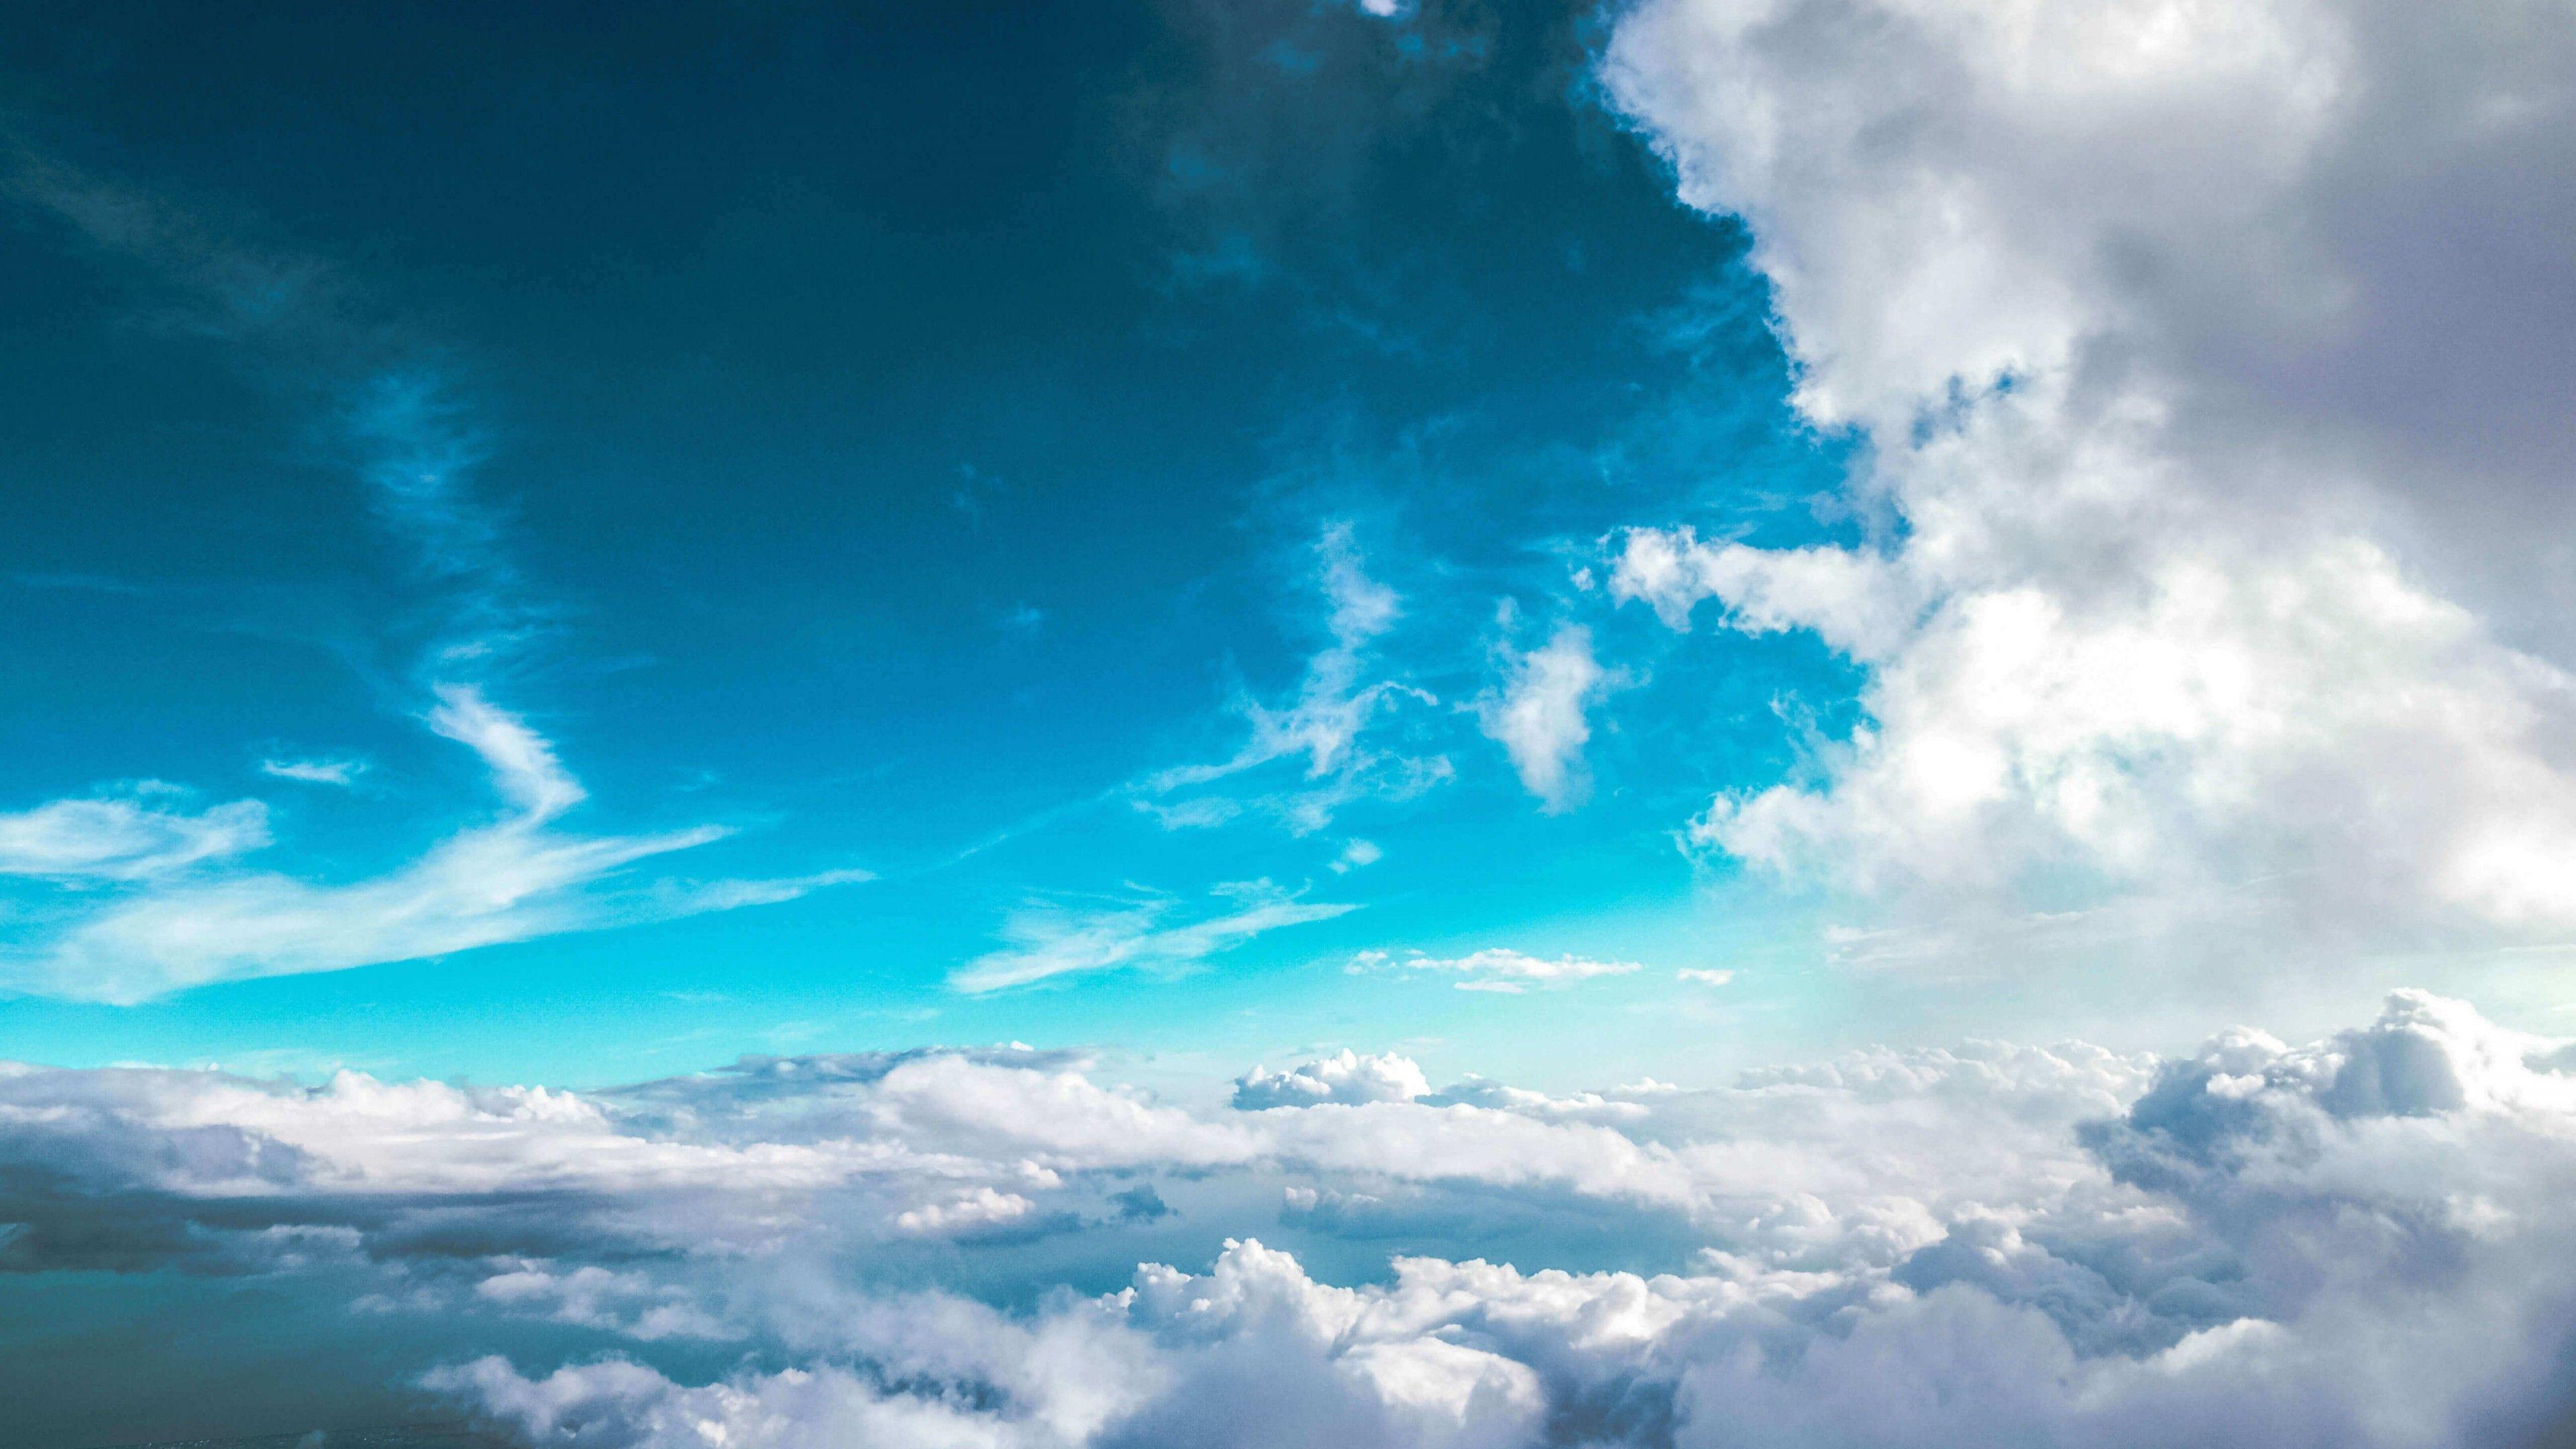 Ultra Hd Cloud Wallpapers Top Free Ultra Hd Cloud Backgrounds Wallpaperaccess